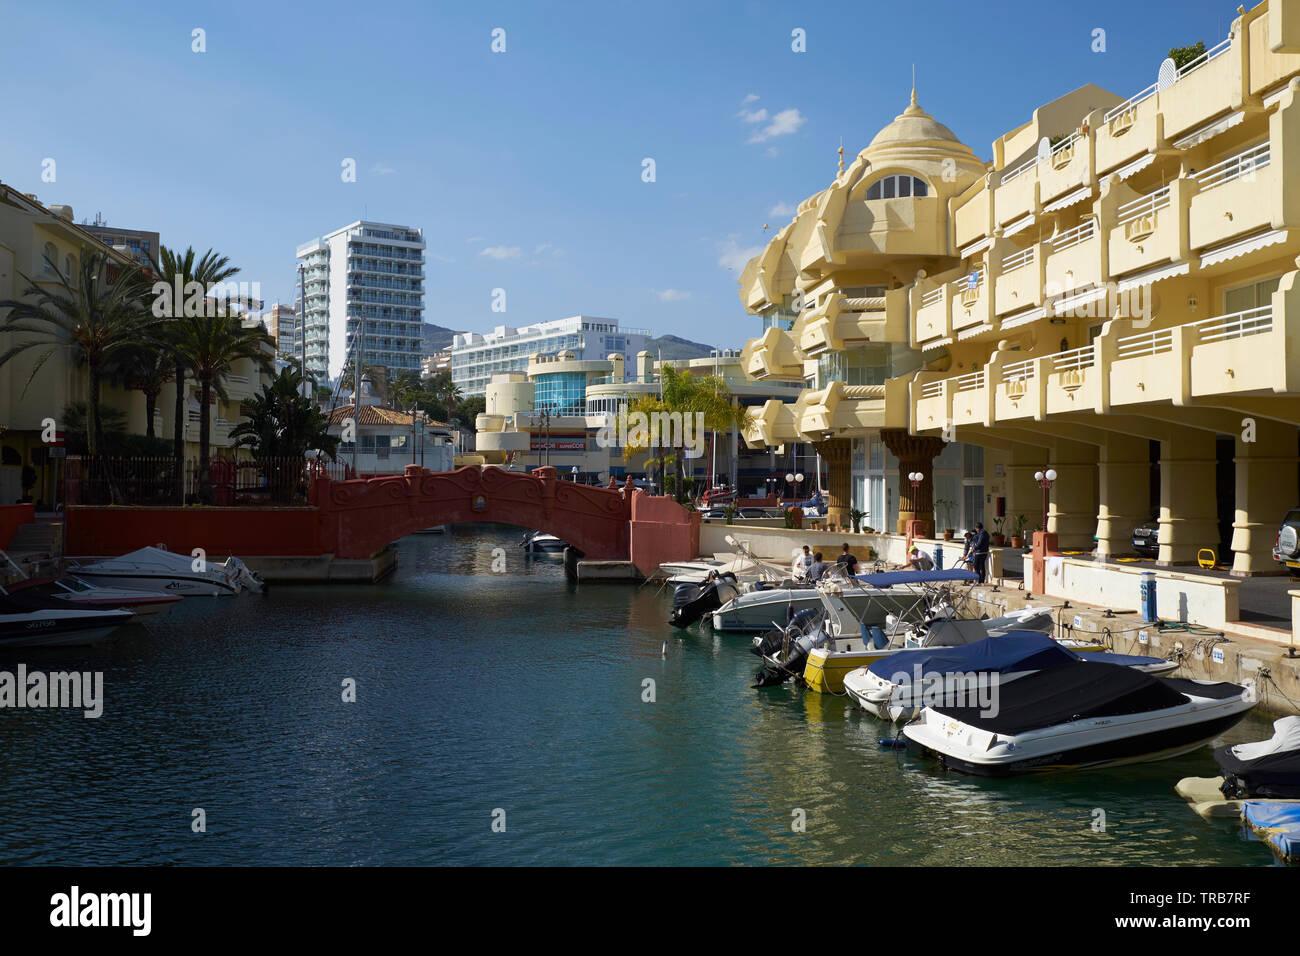 Puerto Marina yacht harbour. Benalmádena, Málaga province, Andalusia, Spain. Stock Photo